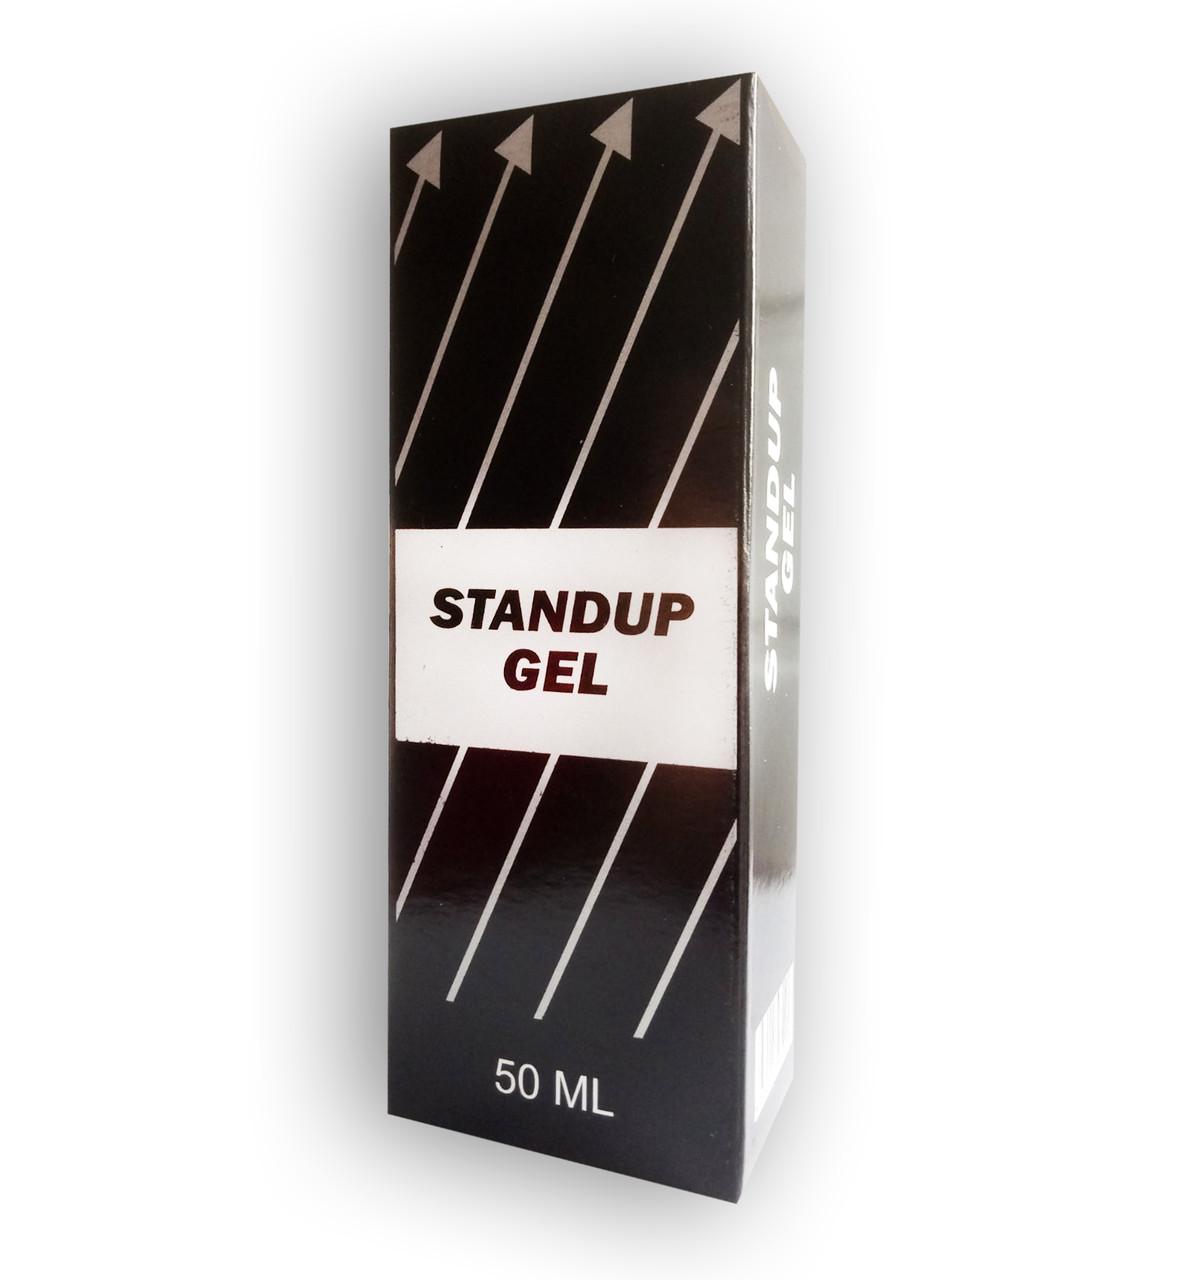 Stand Up Gel для увеличения члена 50 ml